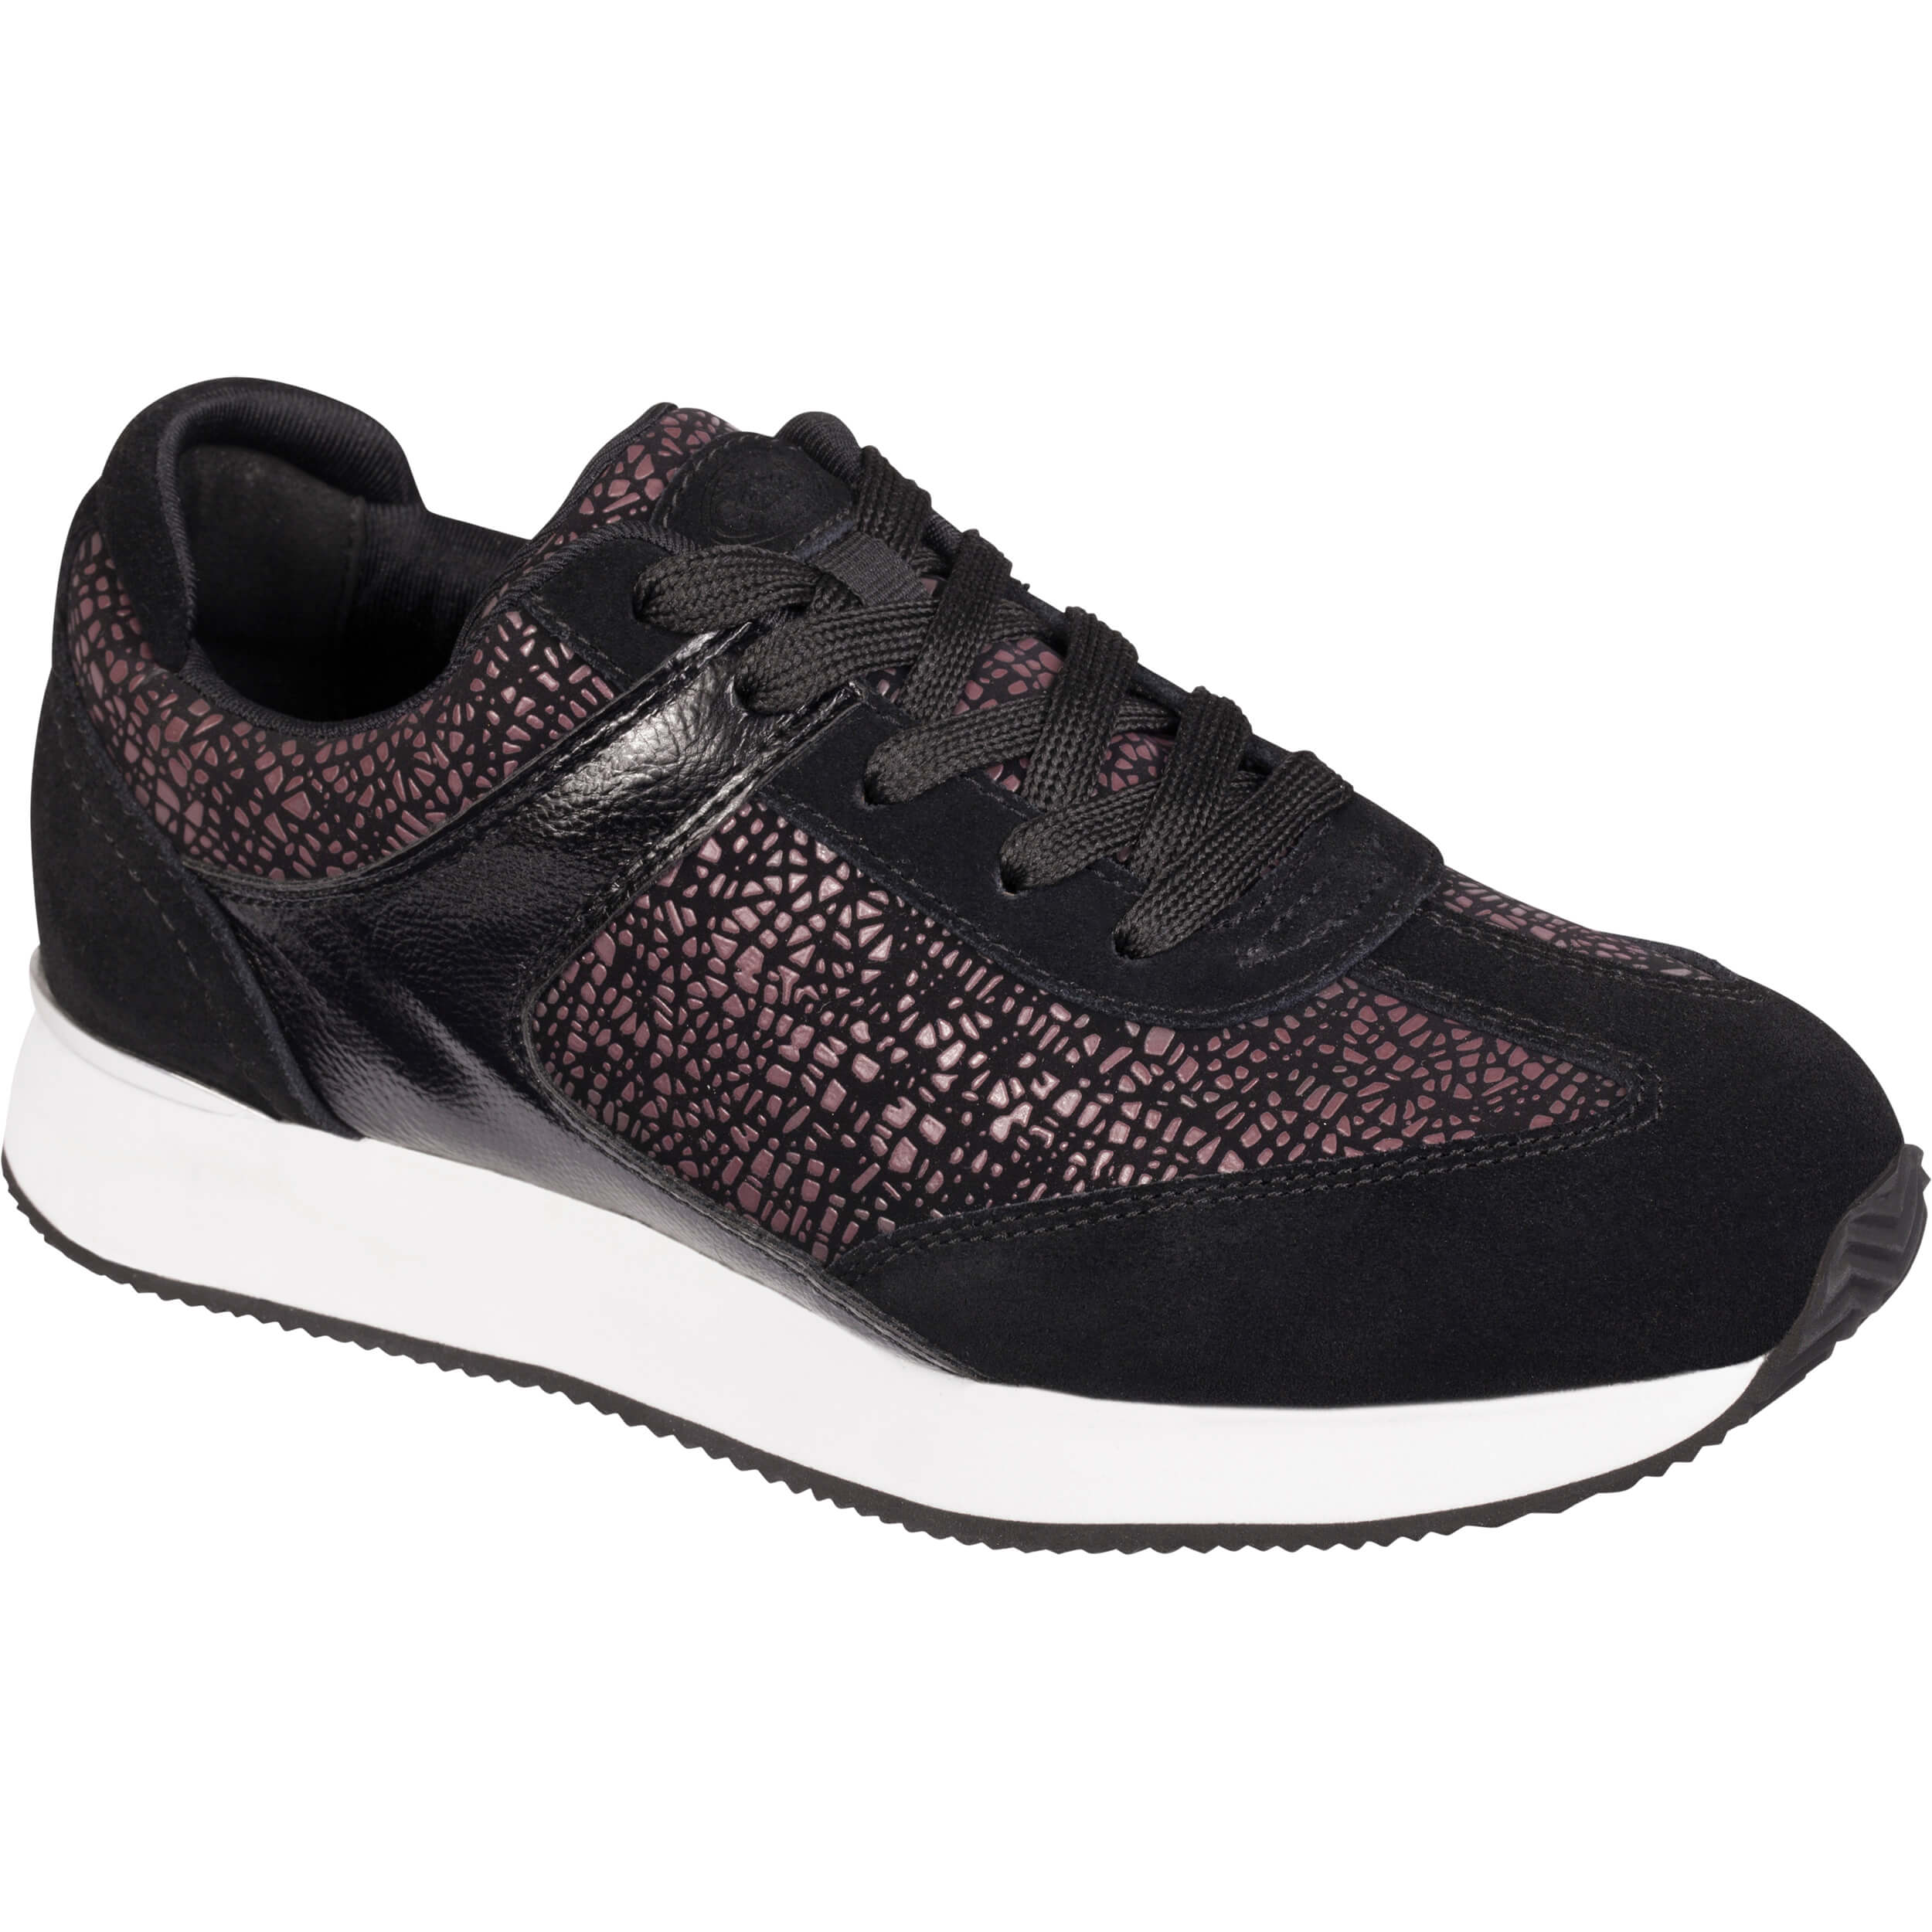 94b3bba540b Dr Scholl Shoes Charlize ΝΕΟ Μαύρο Ανατομικά Παπούτσια, Χαρίζουν Σωστή  Στάση & Φυσικό, Χωρίς ...